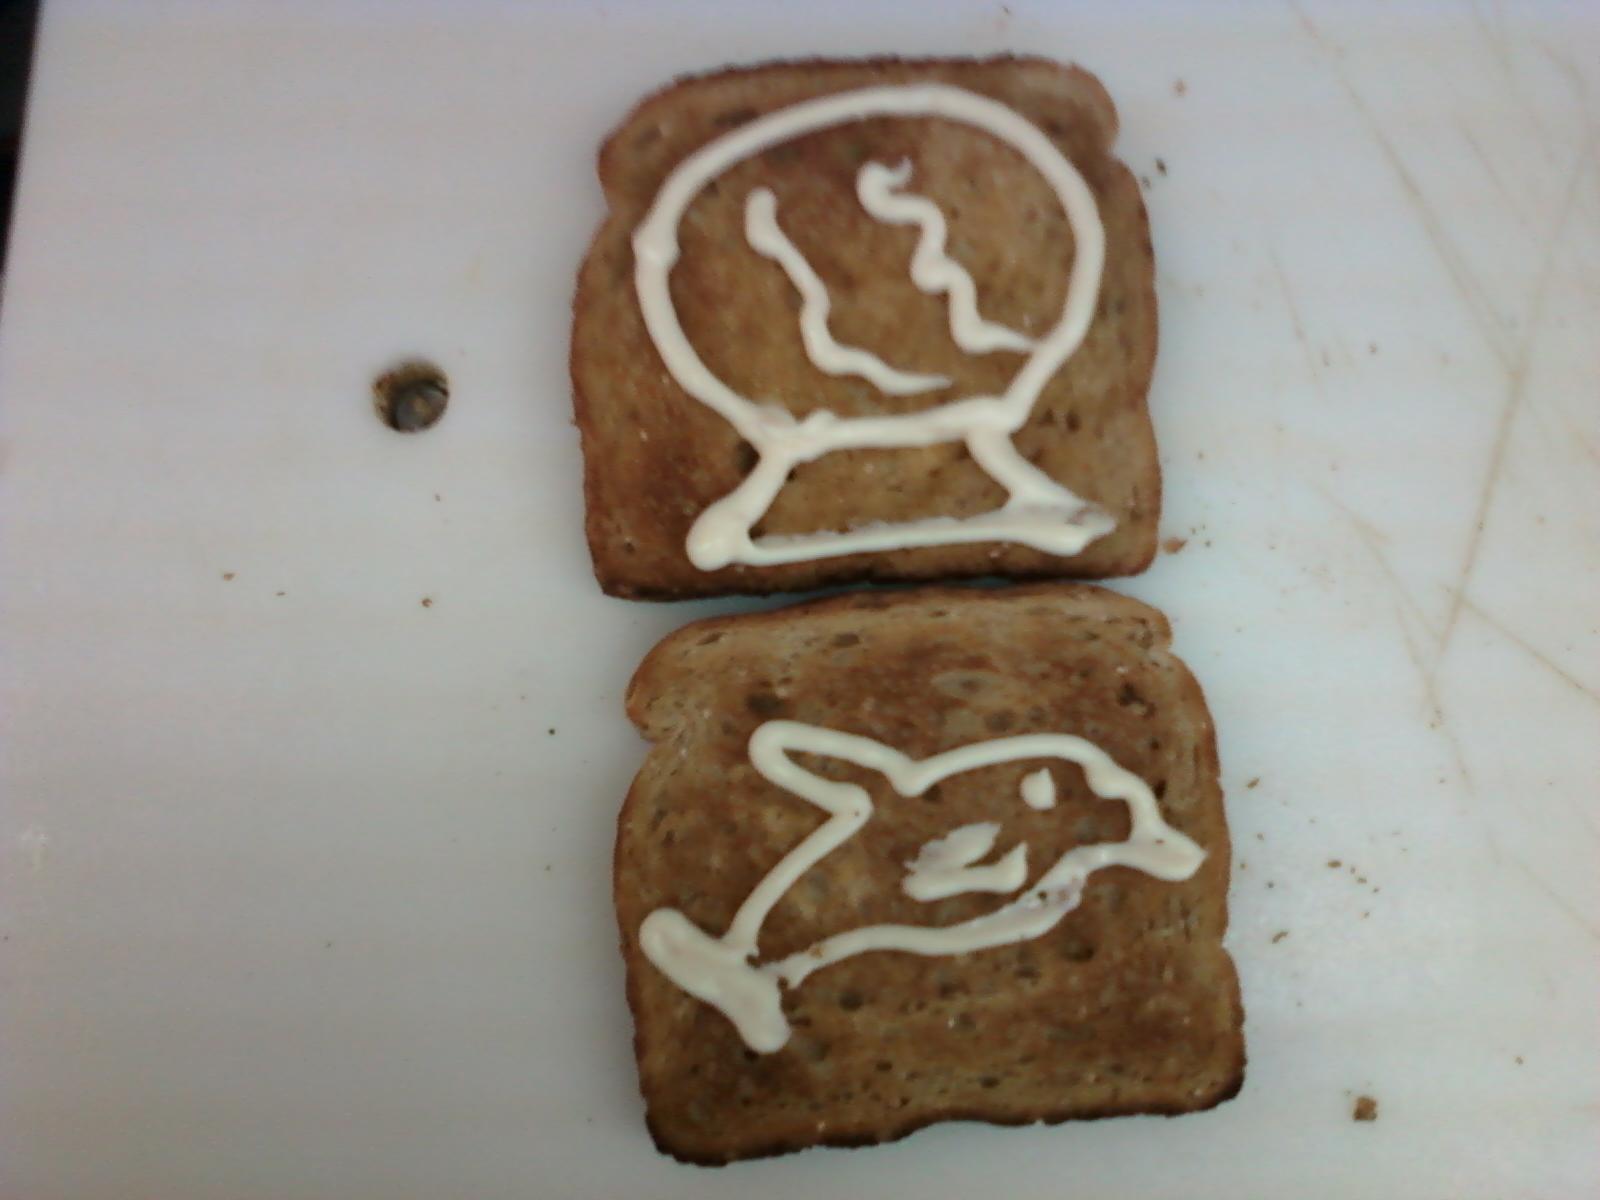 sandwich_art/0702111107.jpg